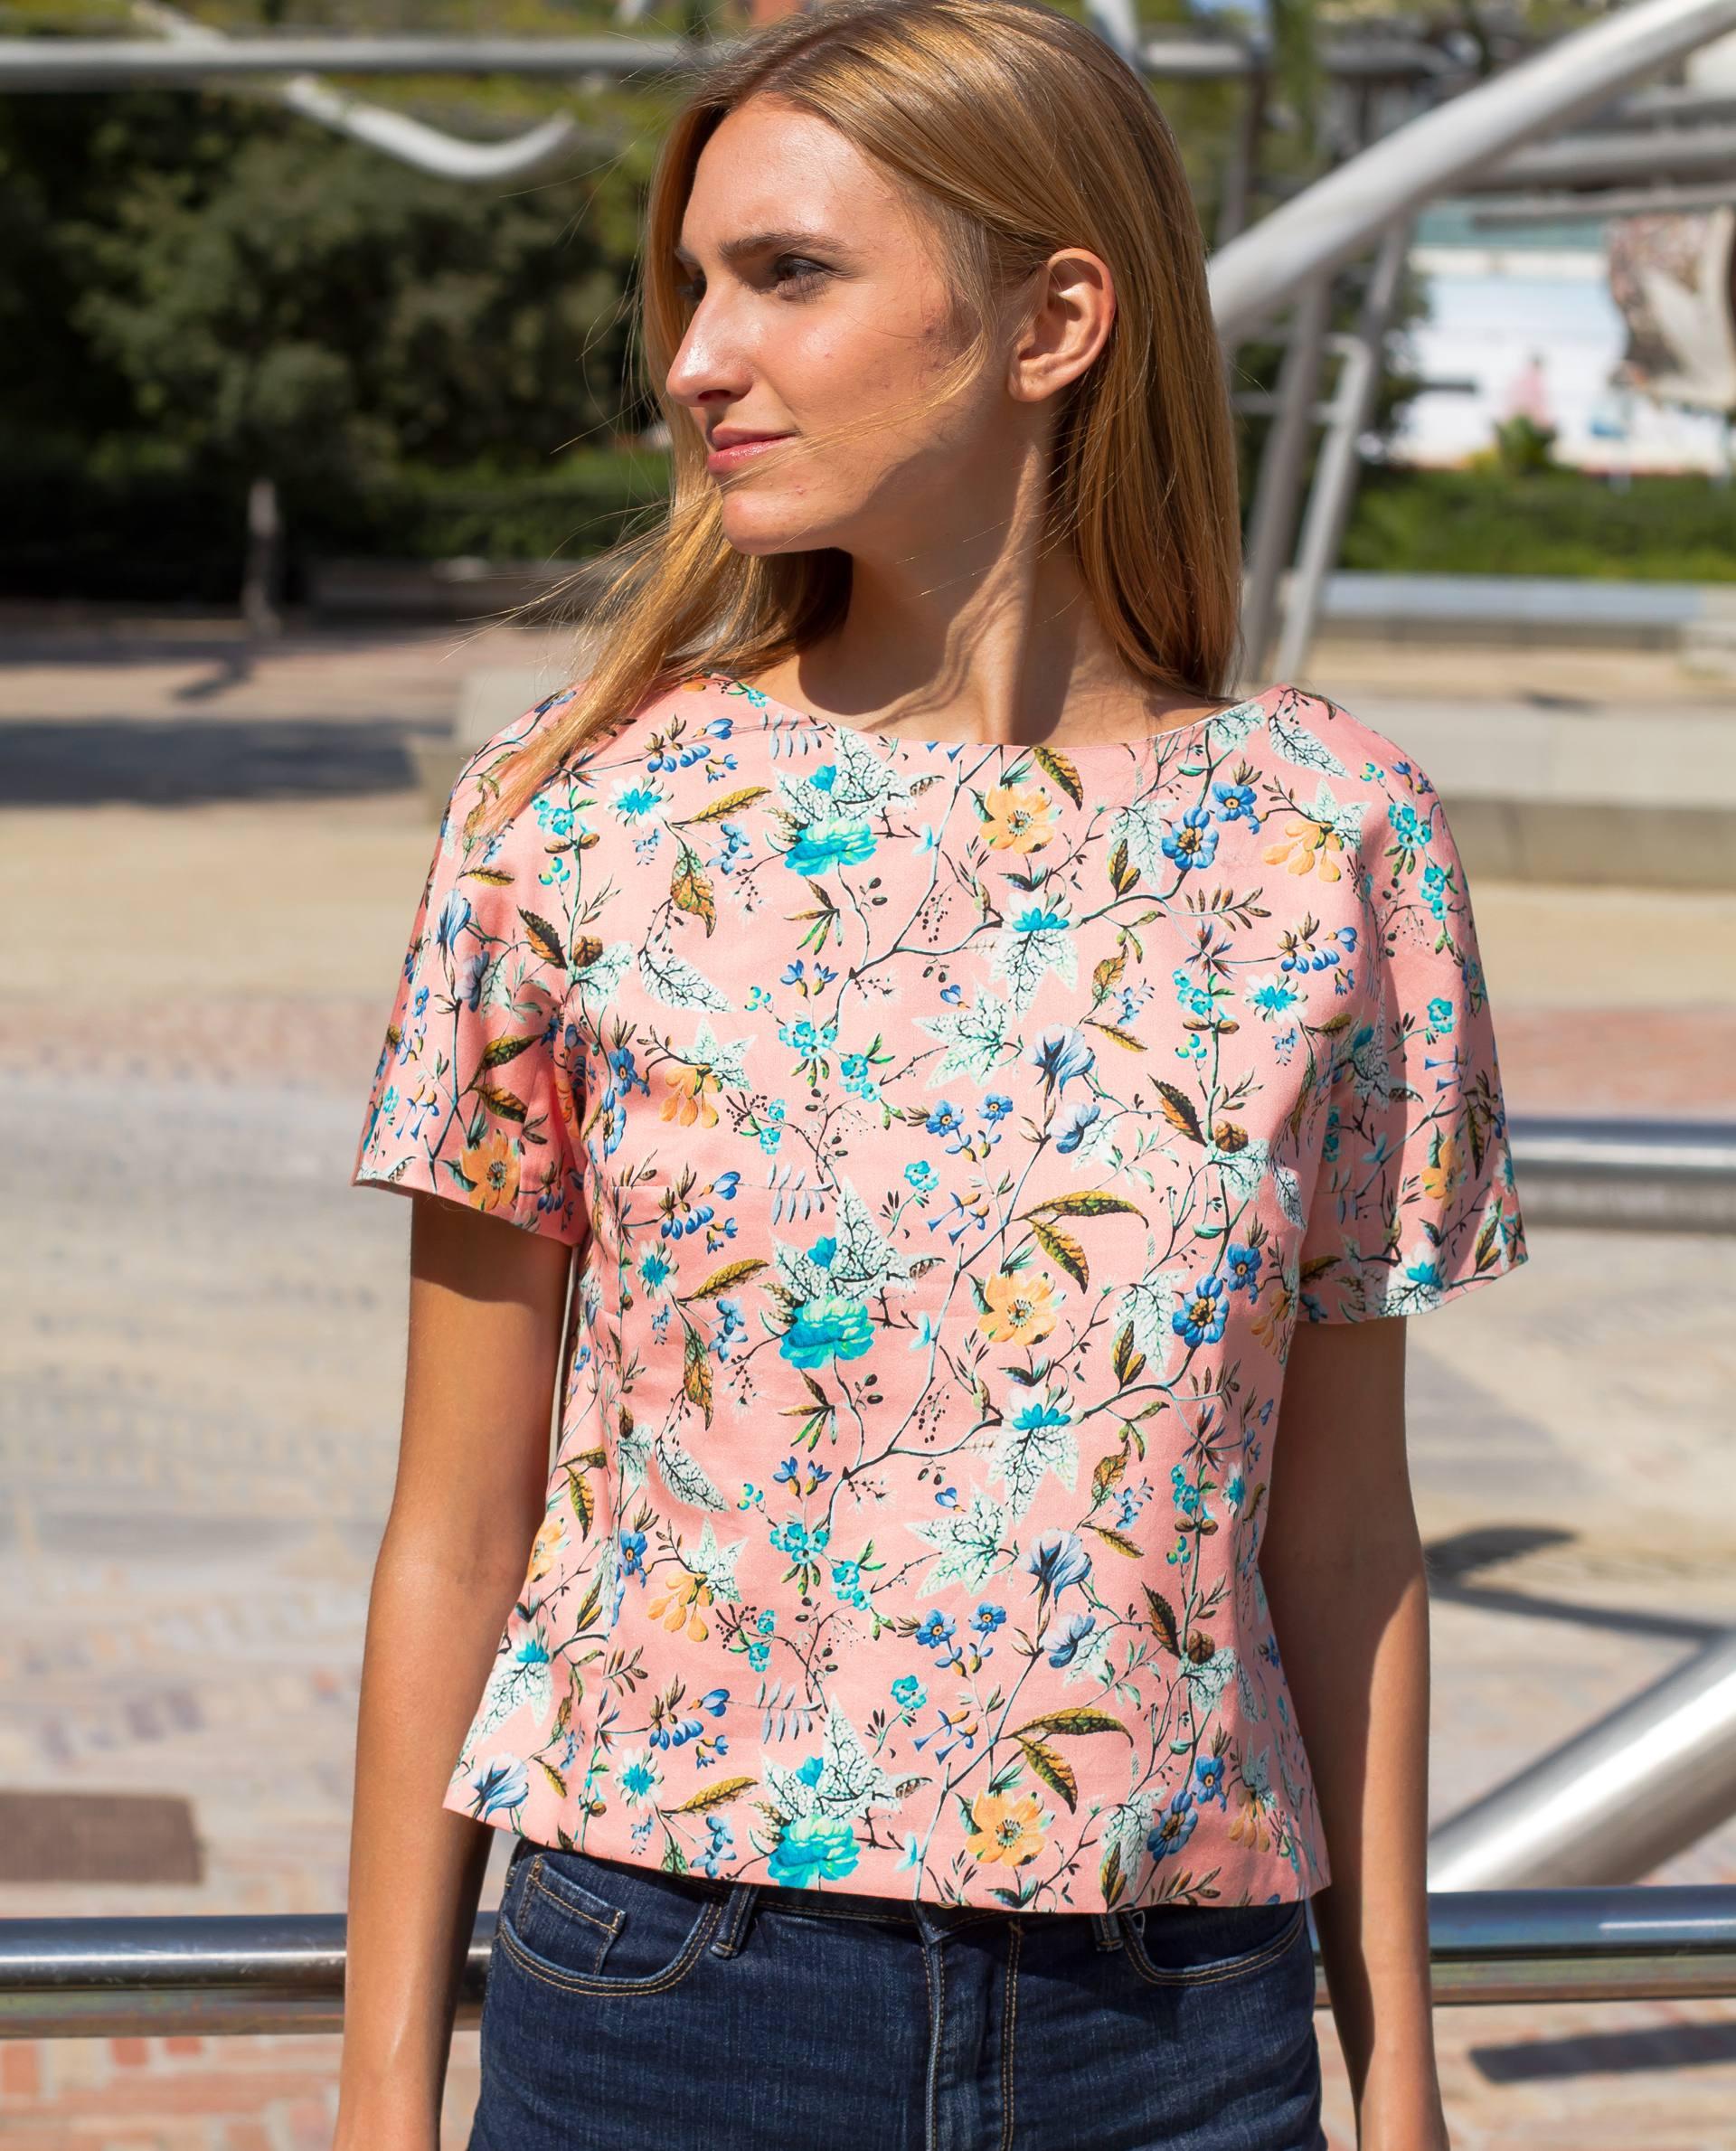 PRÊT À PORTER-SPRING/SUMMER 2018 - TOPS - Top de algodón rosa estampado con flores